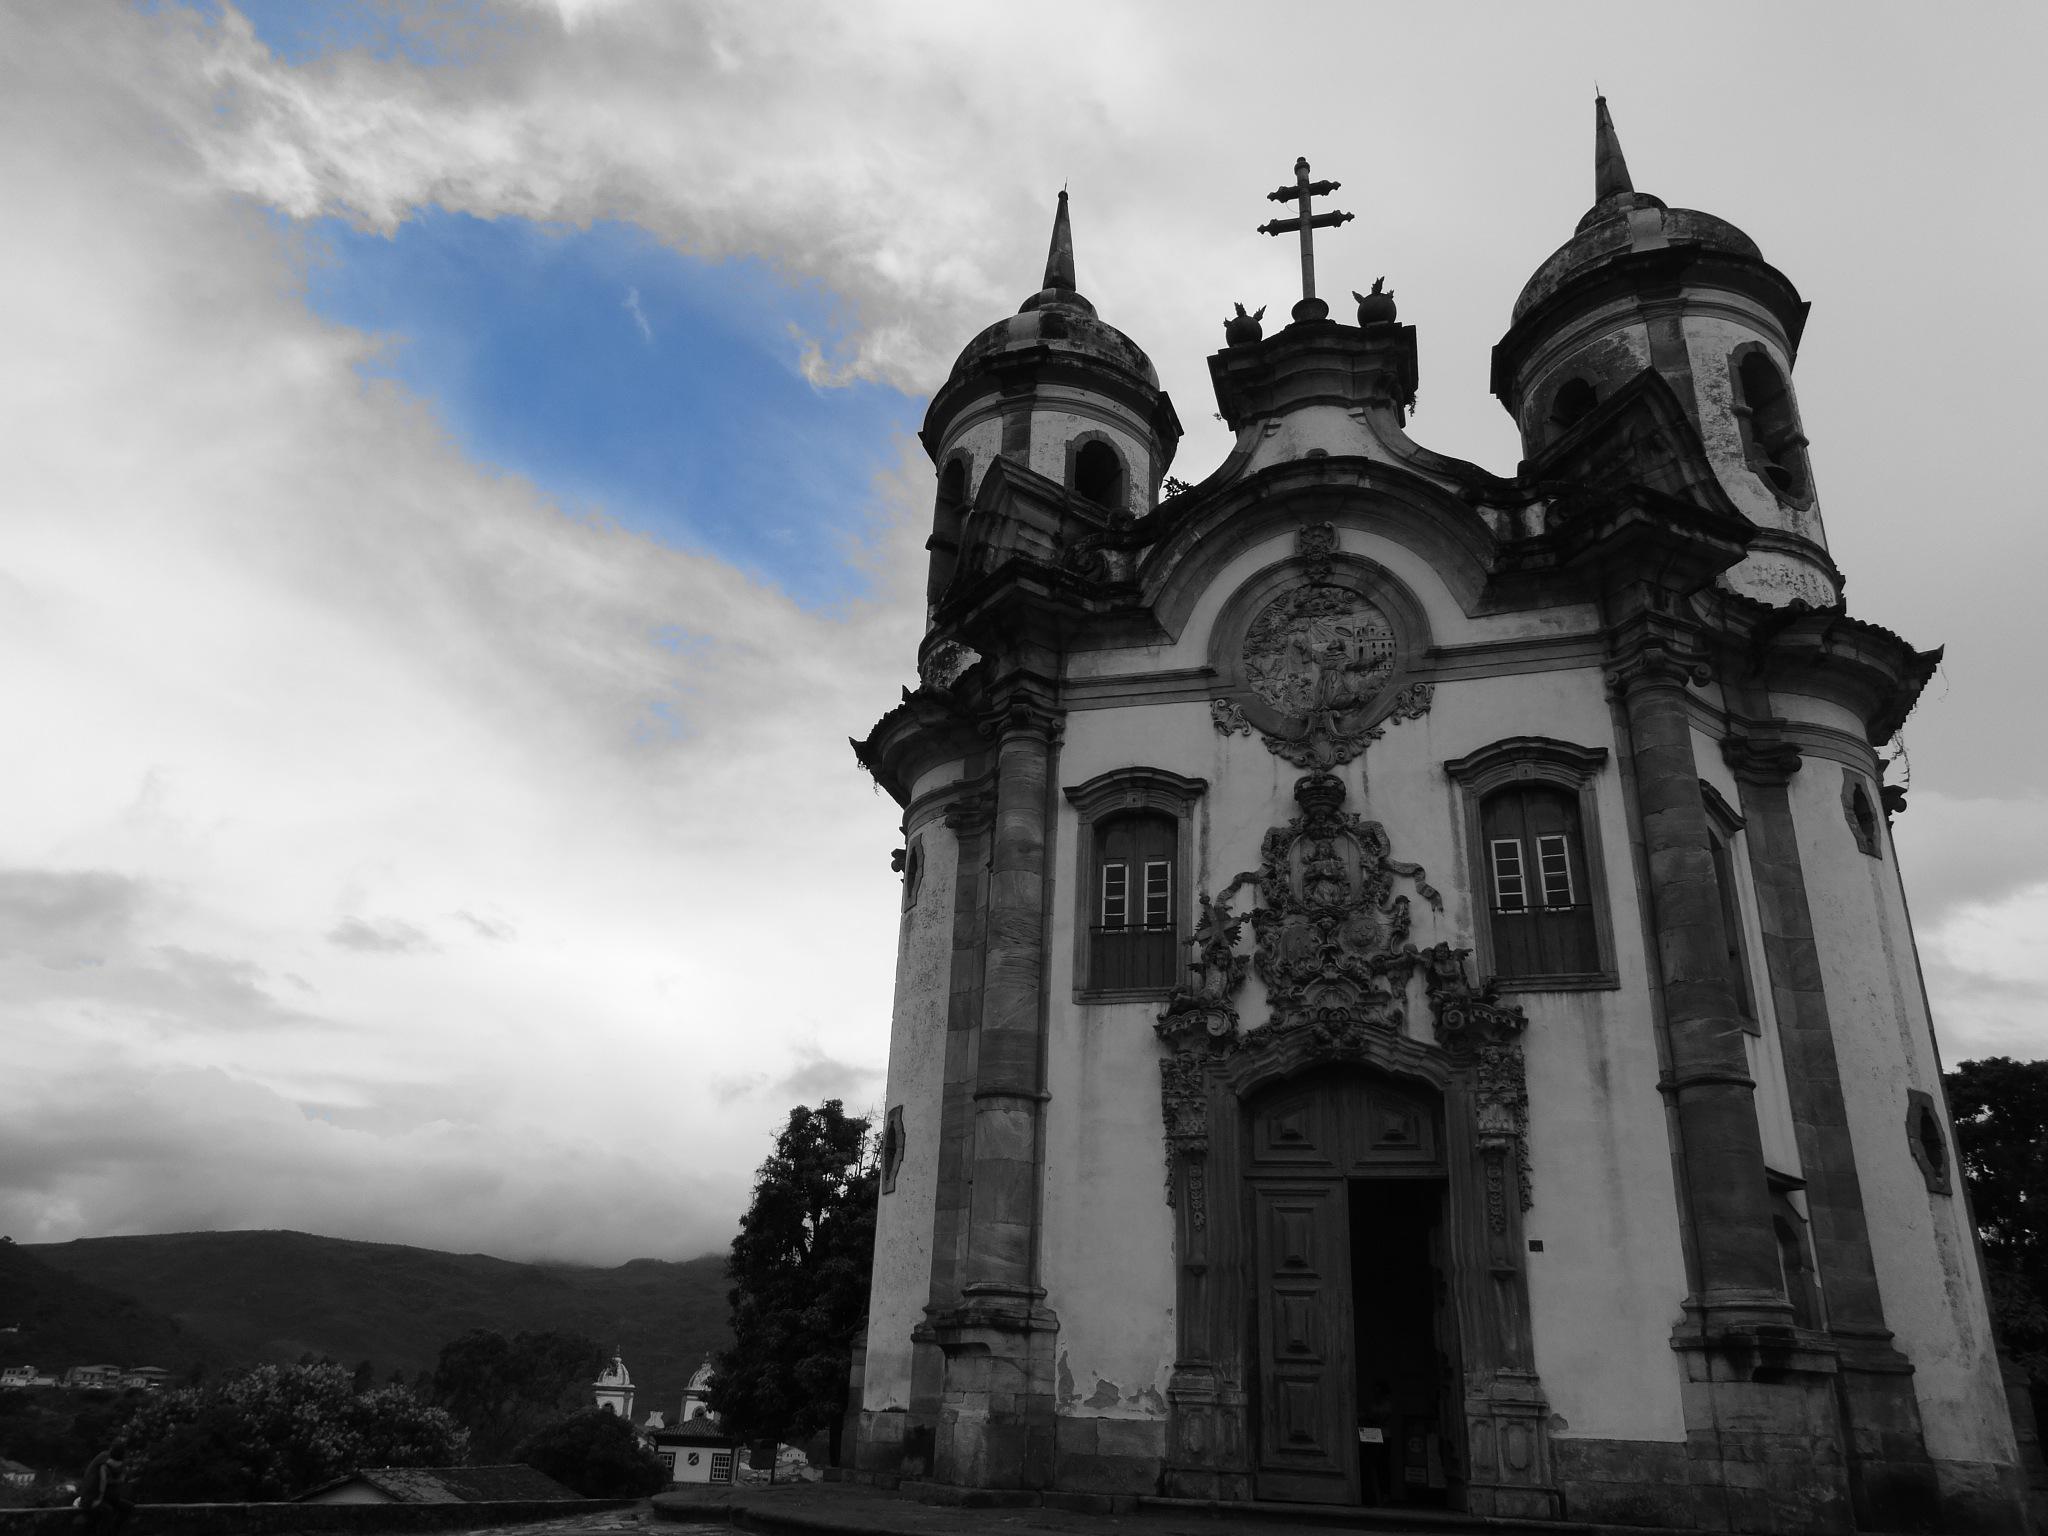 religiosidade by Maciel Panisson